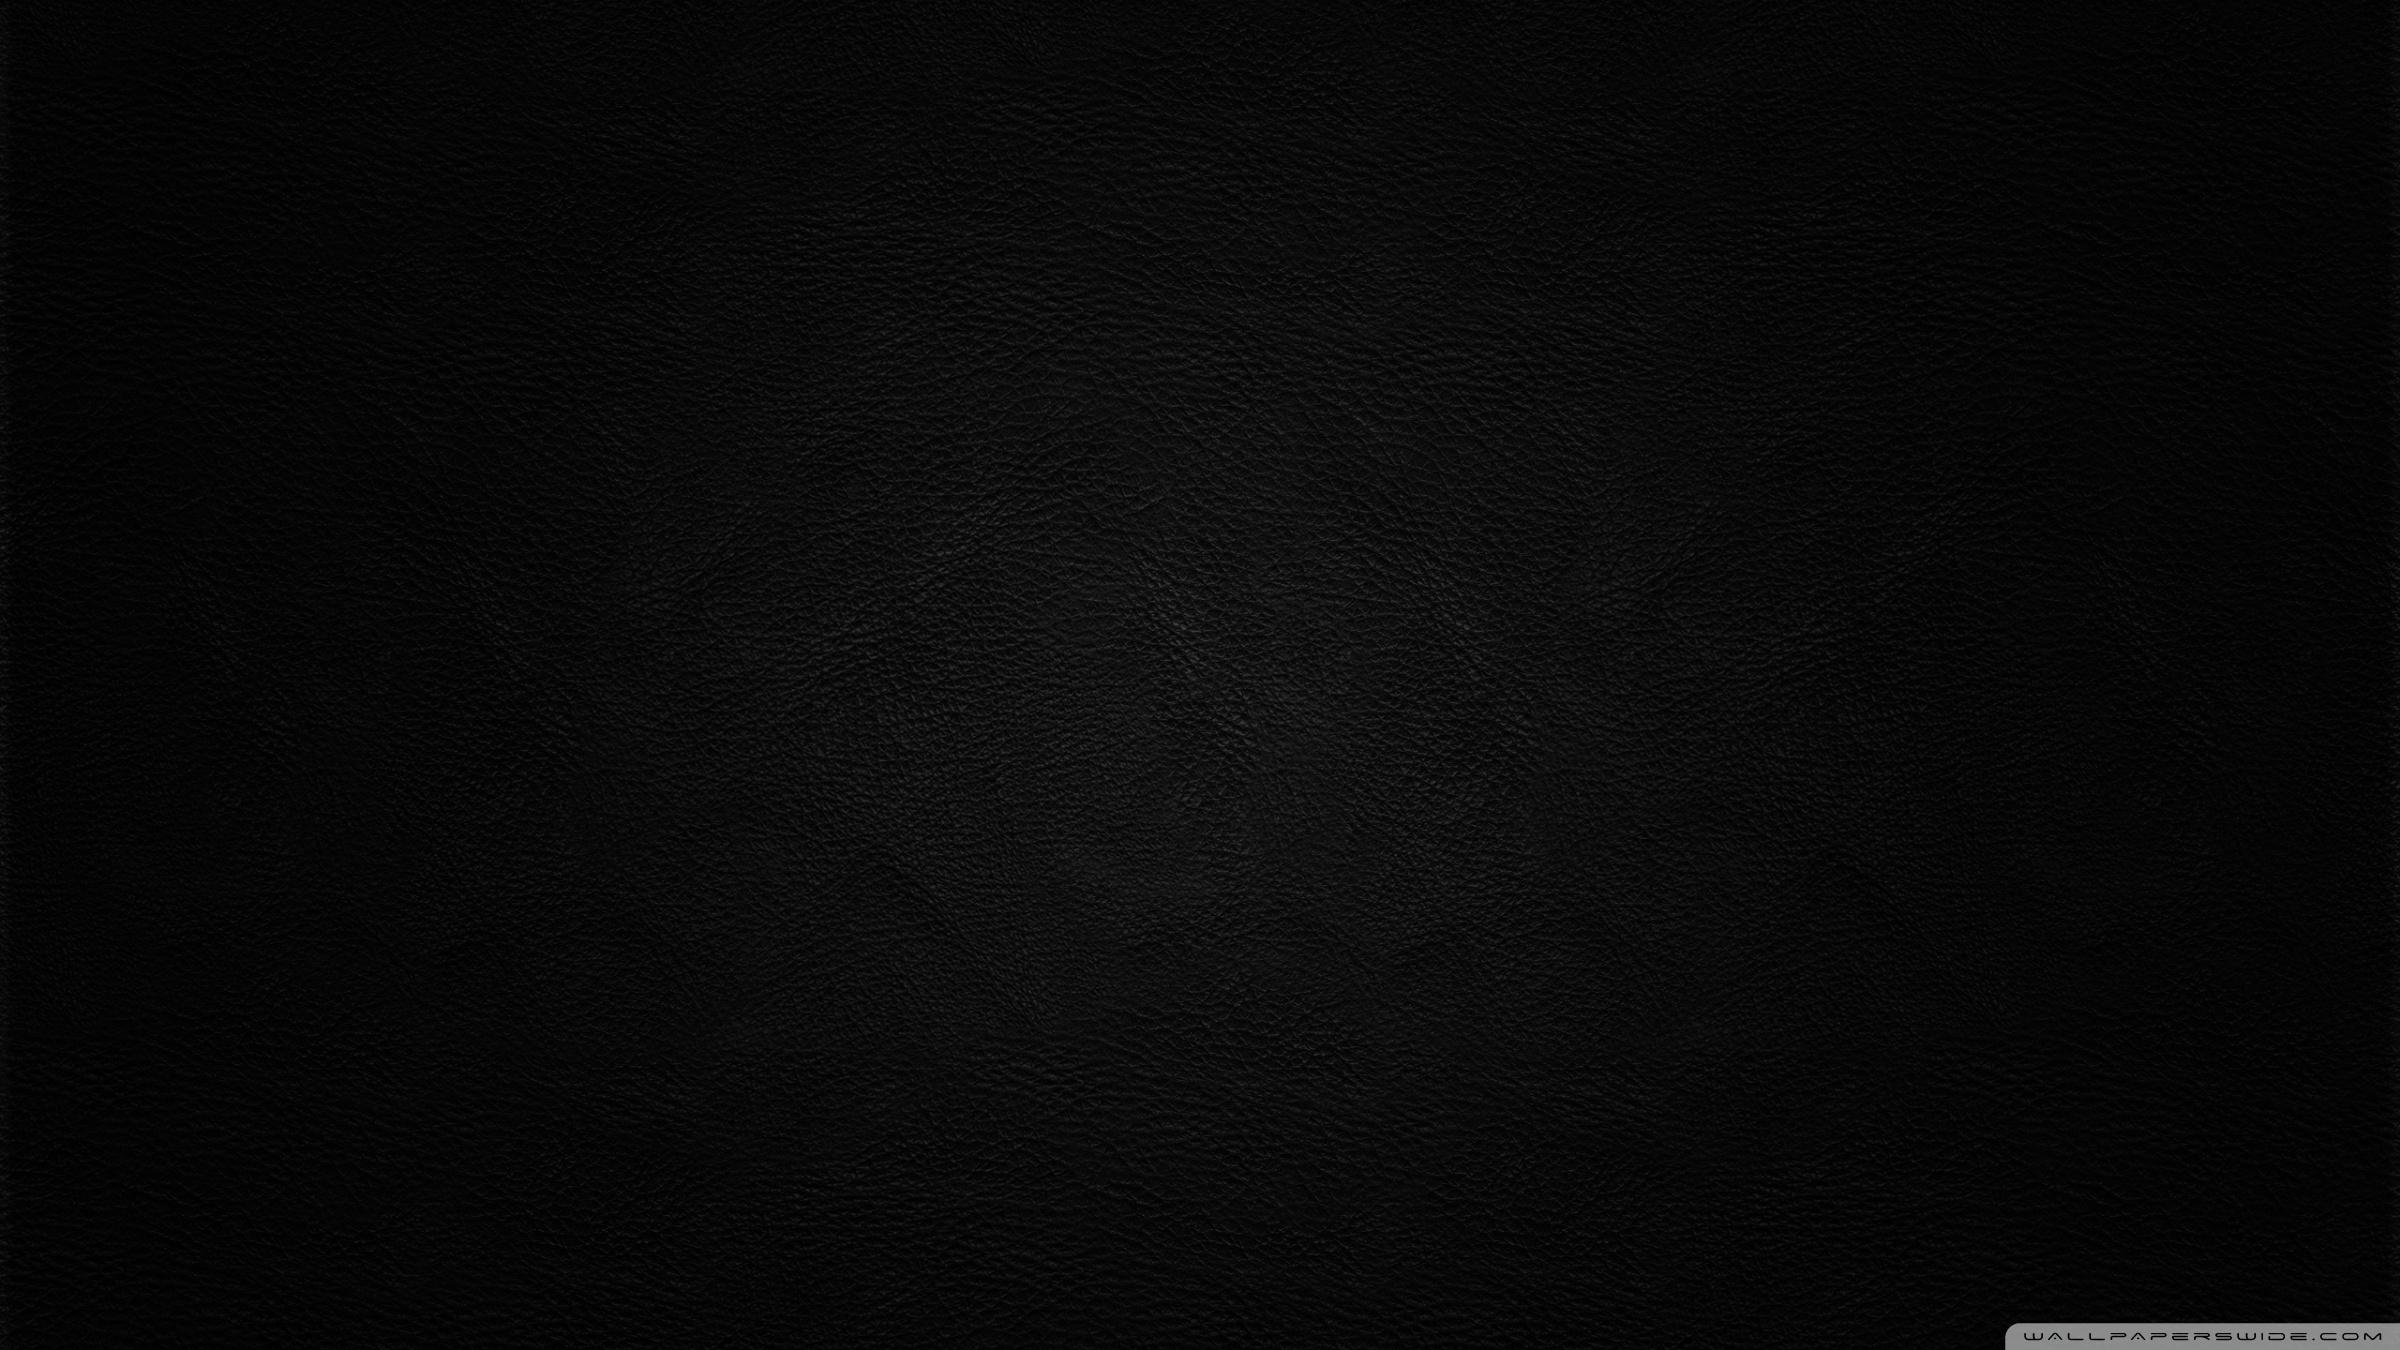 Black Background Leather Wallpaper 2400x1350 Savisas Com